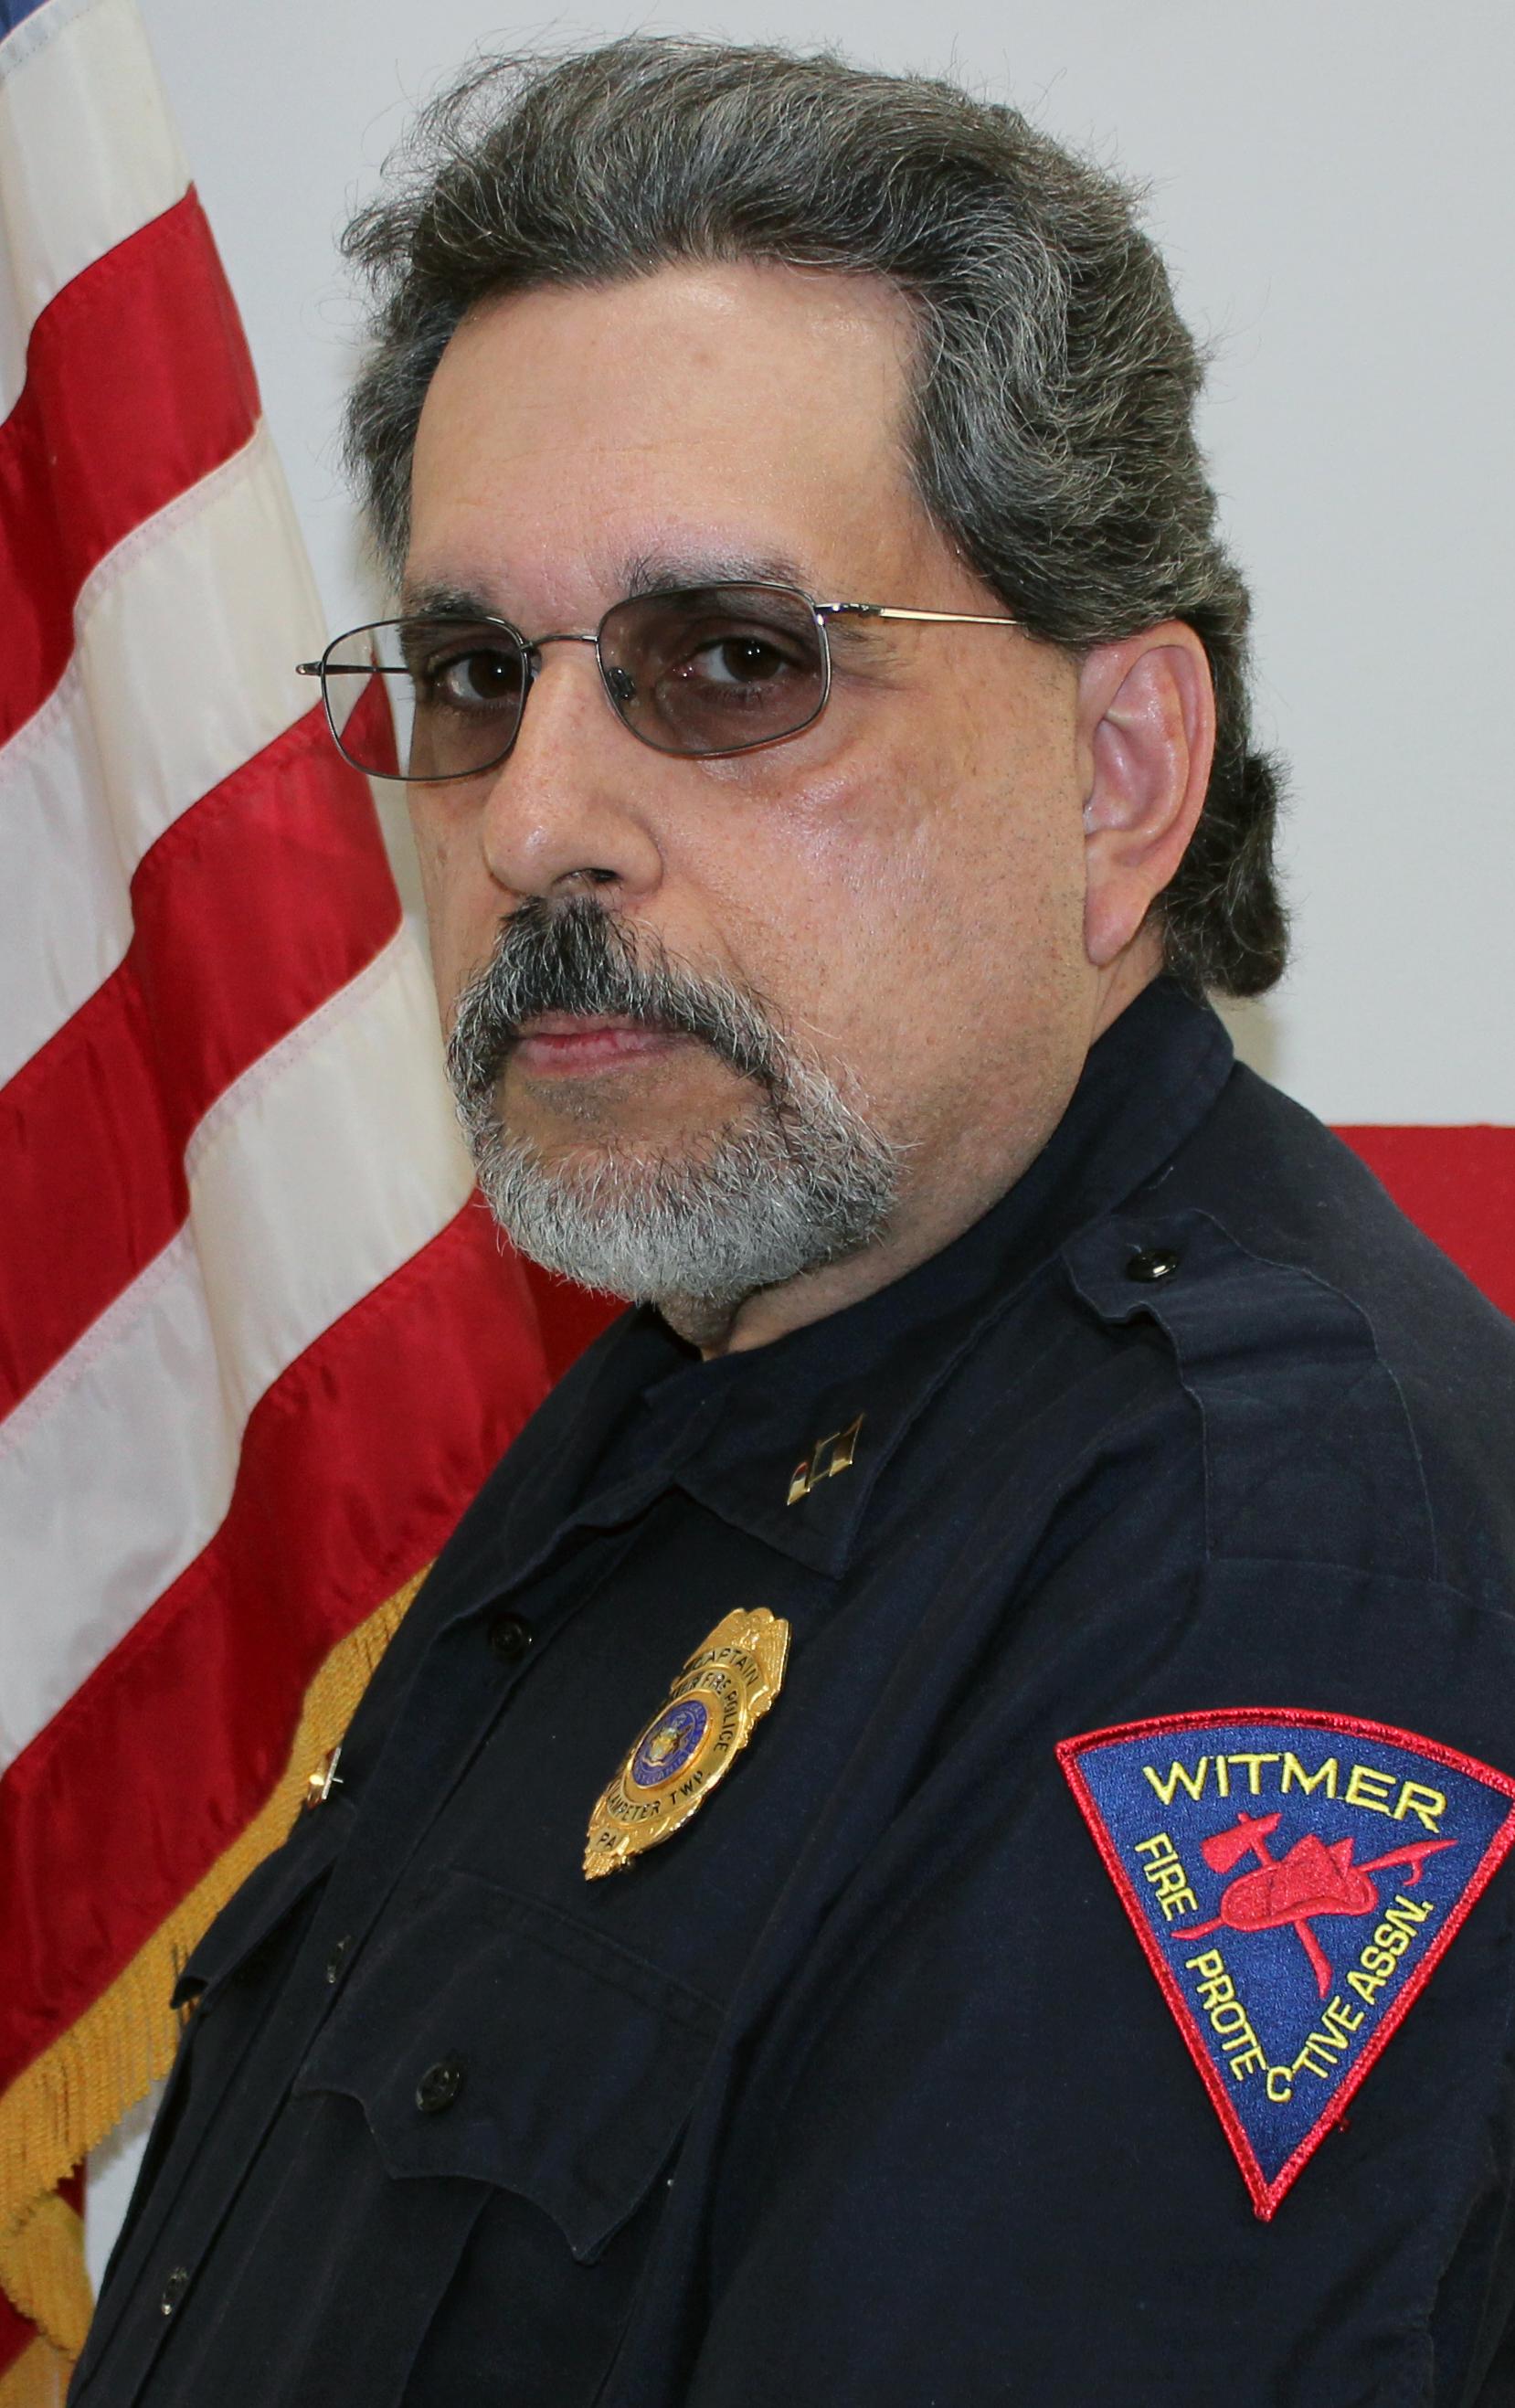 Fire Police Captain